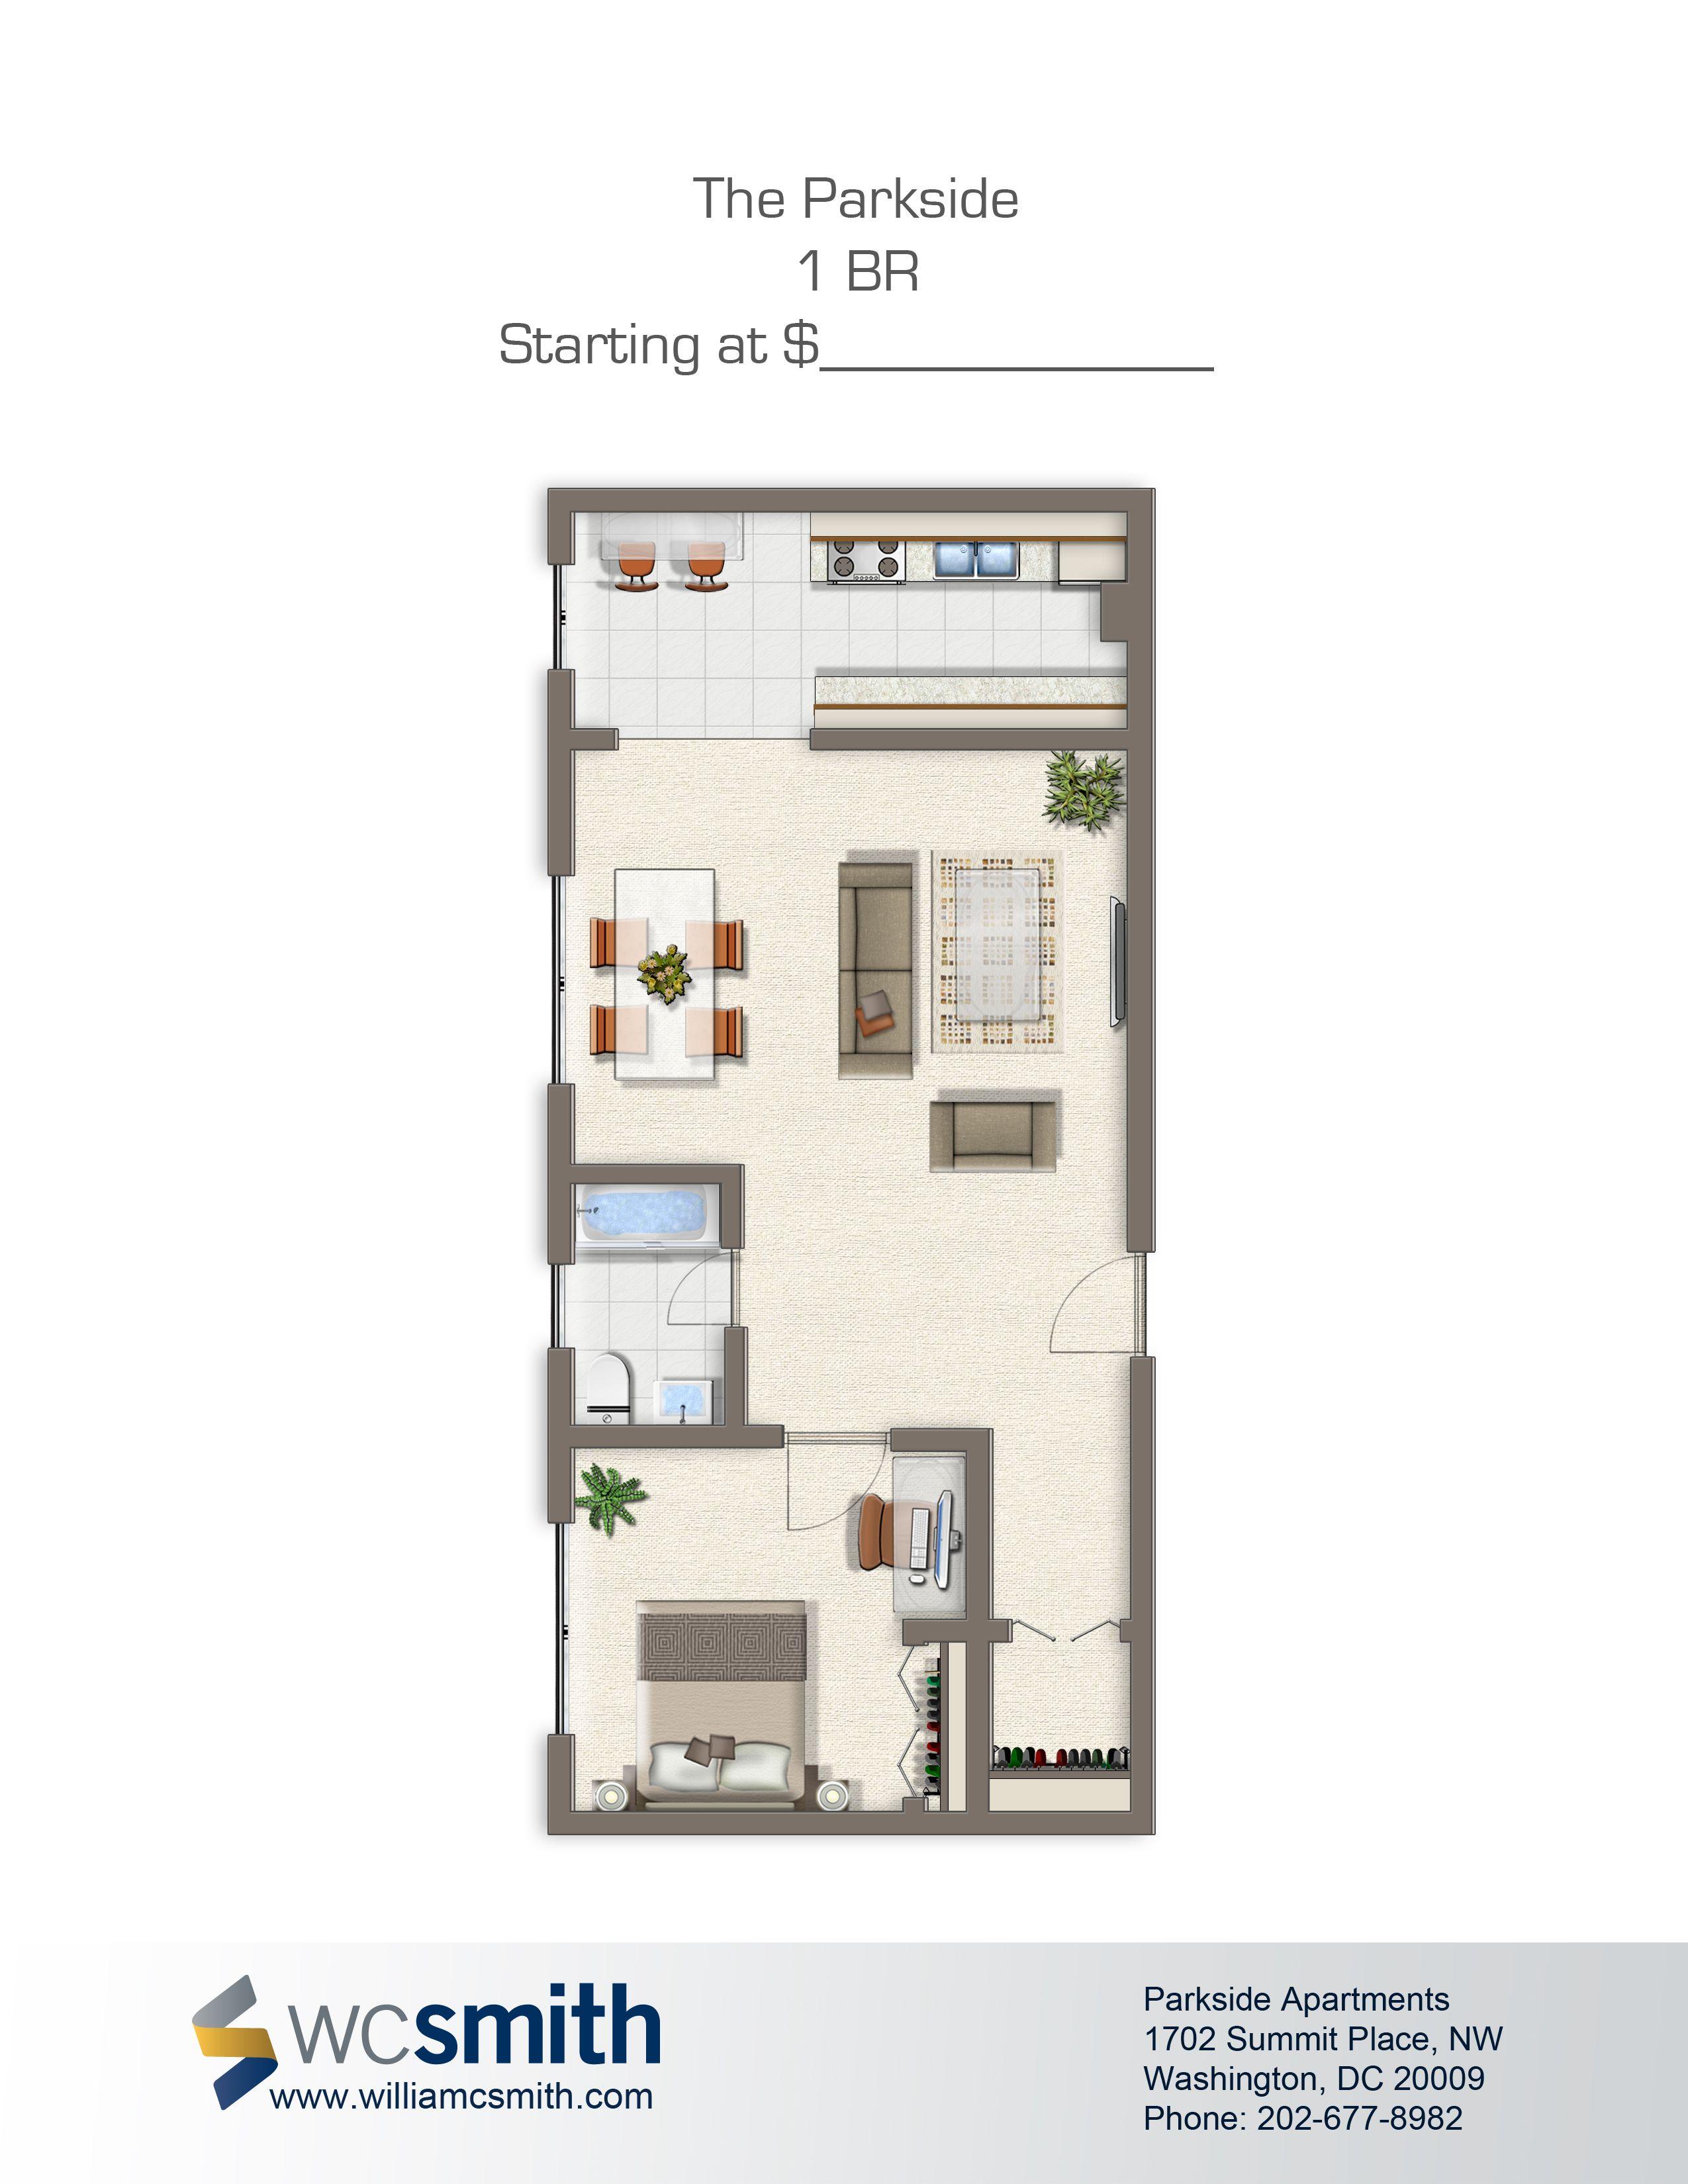 Parkside Apartments In Washington DC Bedroom floor plans